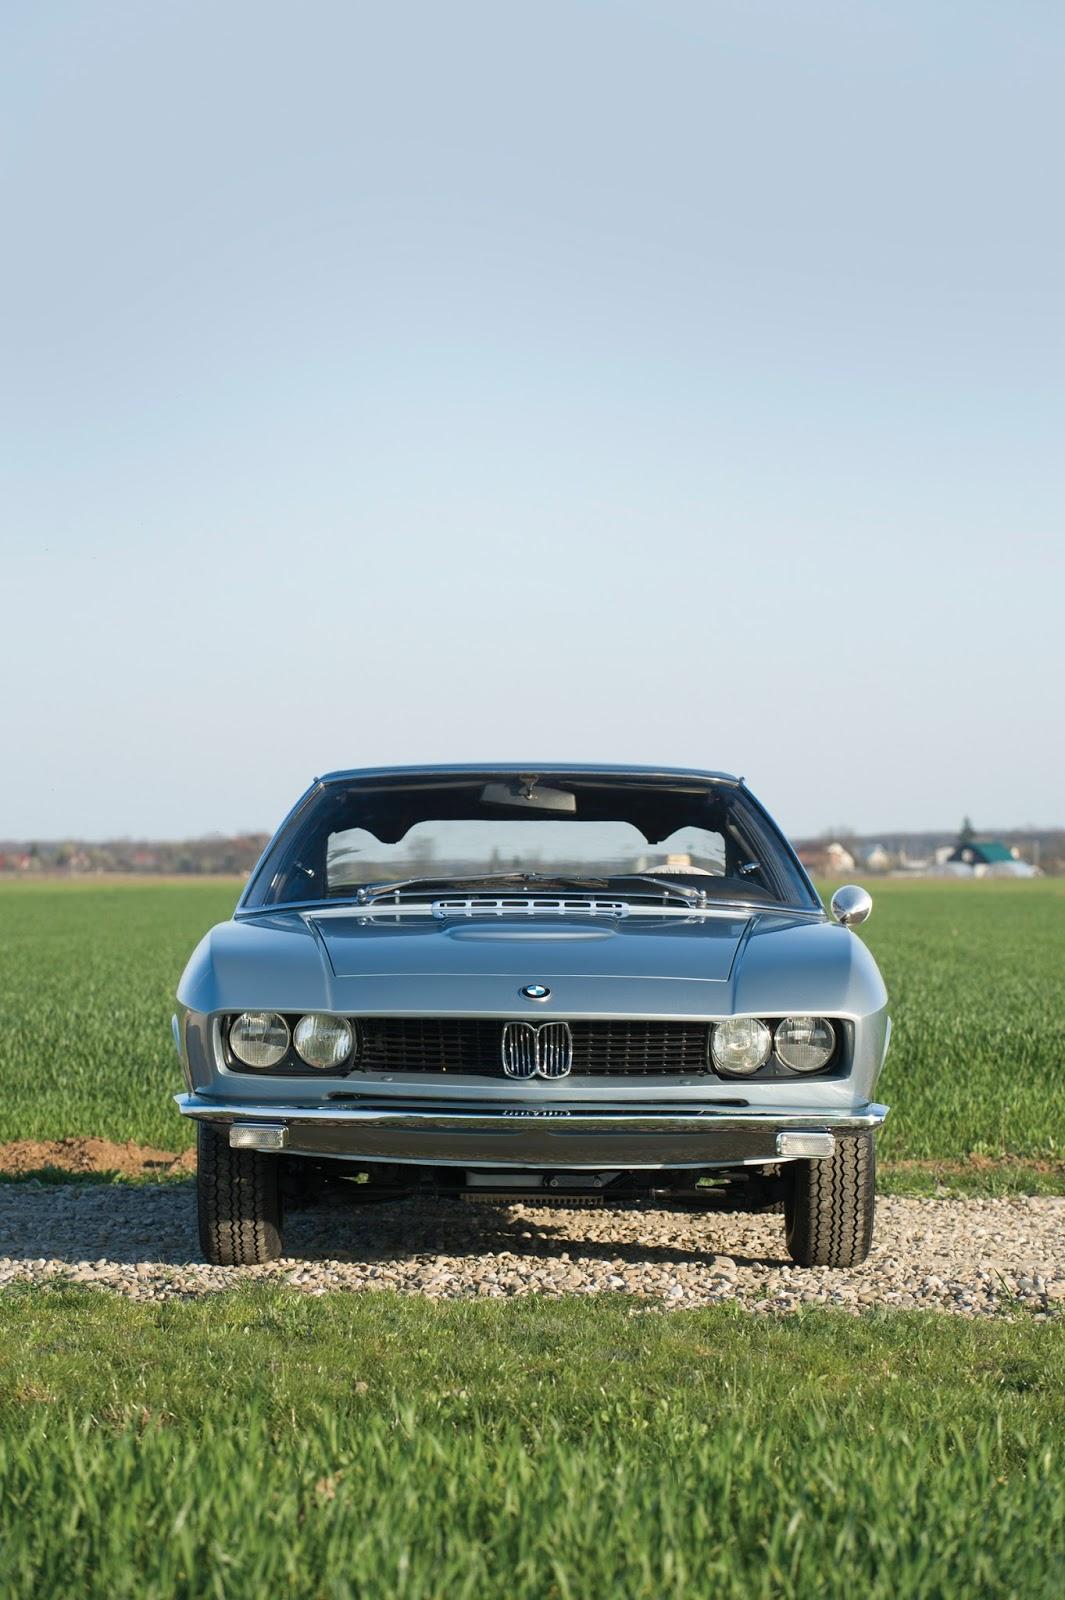 One Off 1967 Bmw Glas 3000 V8 Fastback By Frua Hitting The